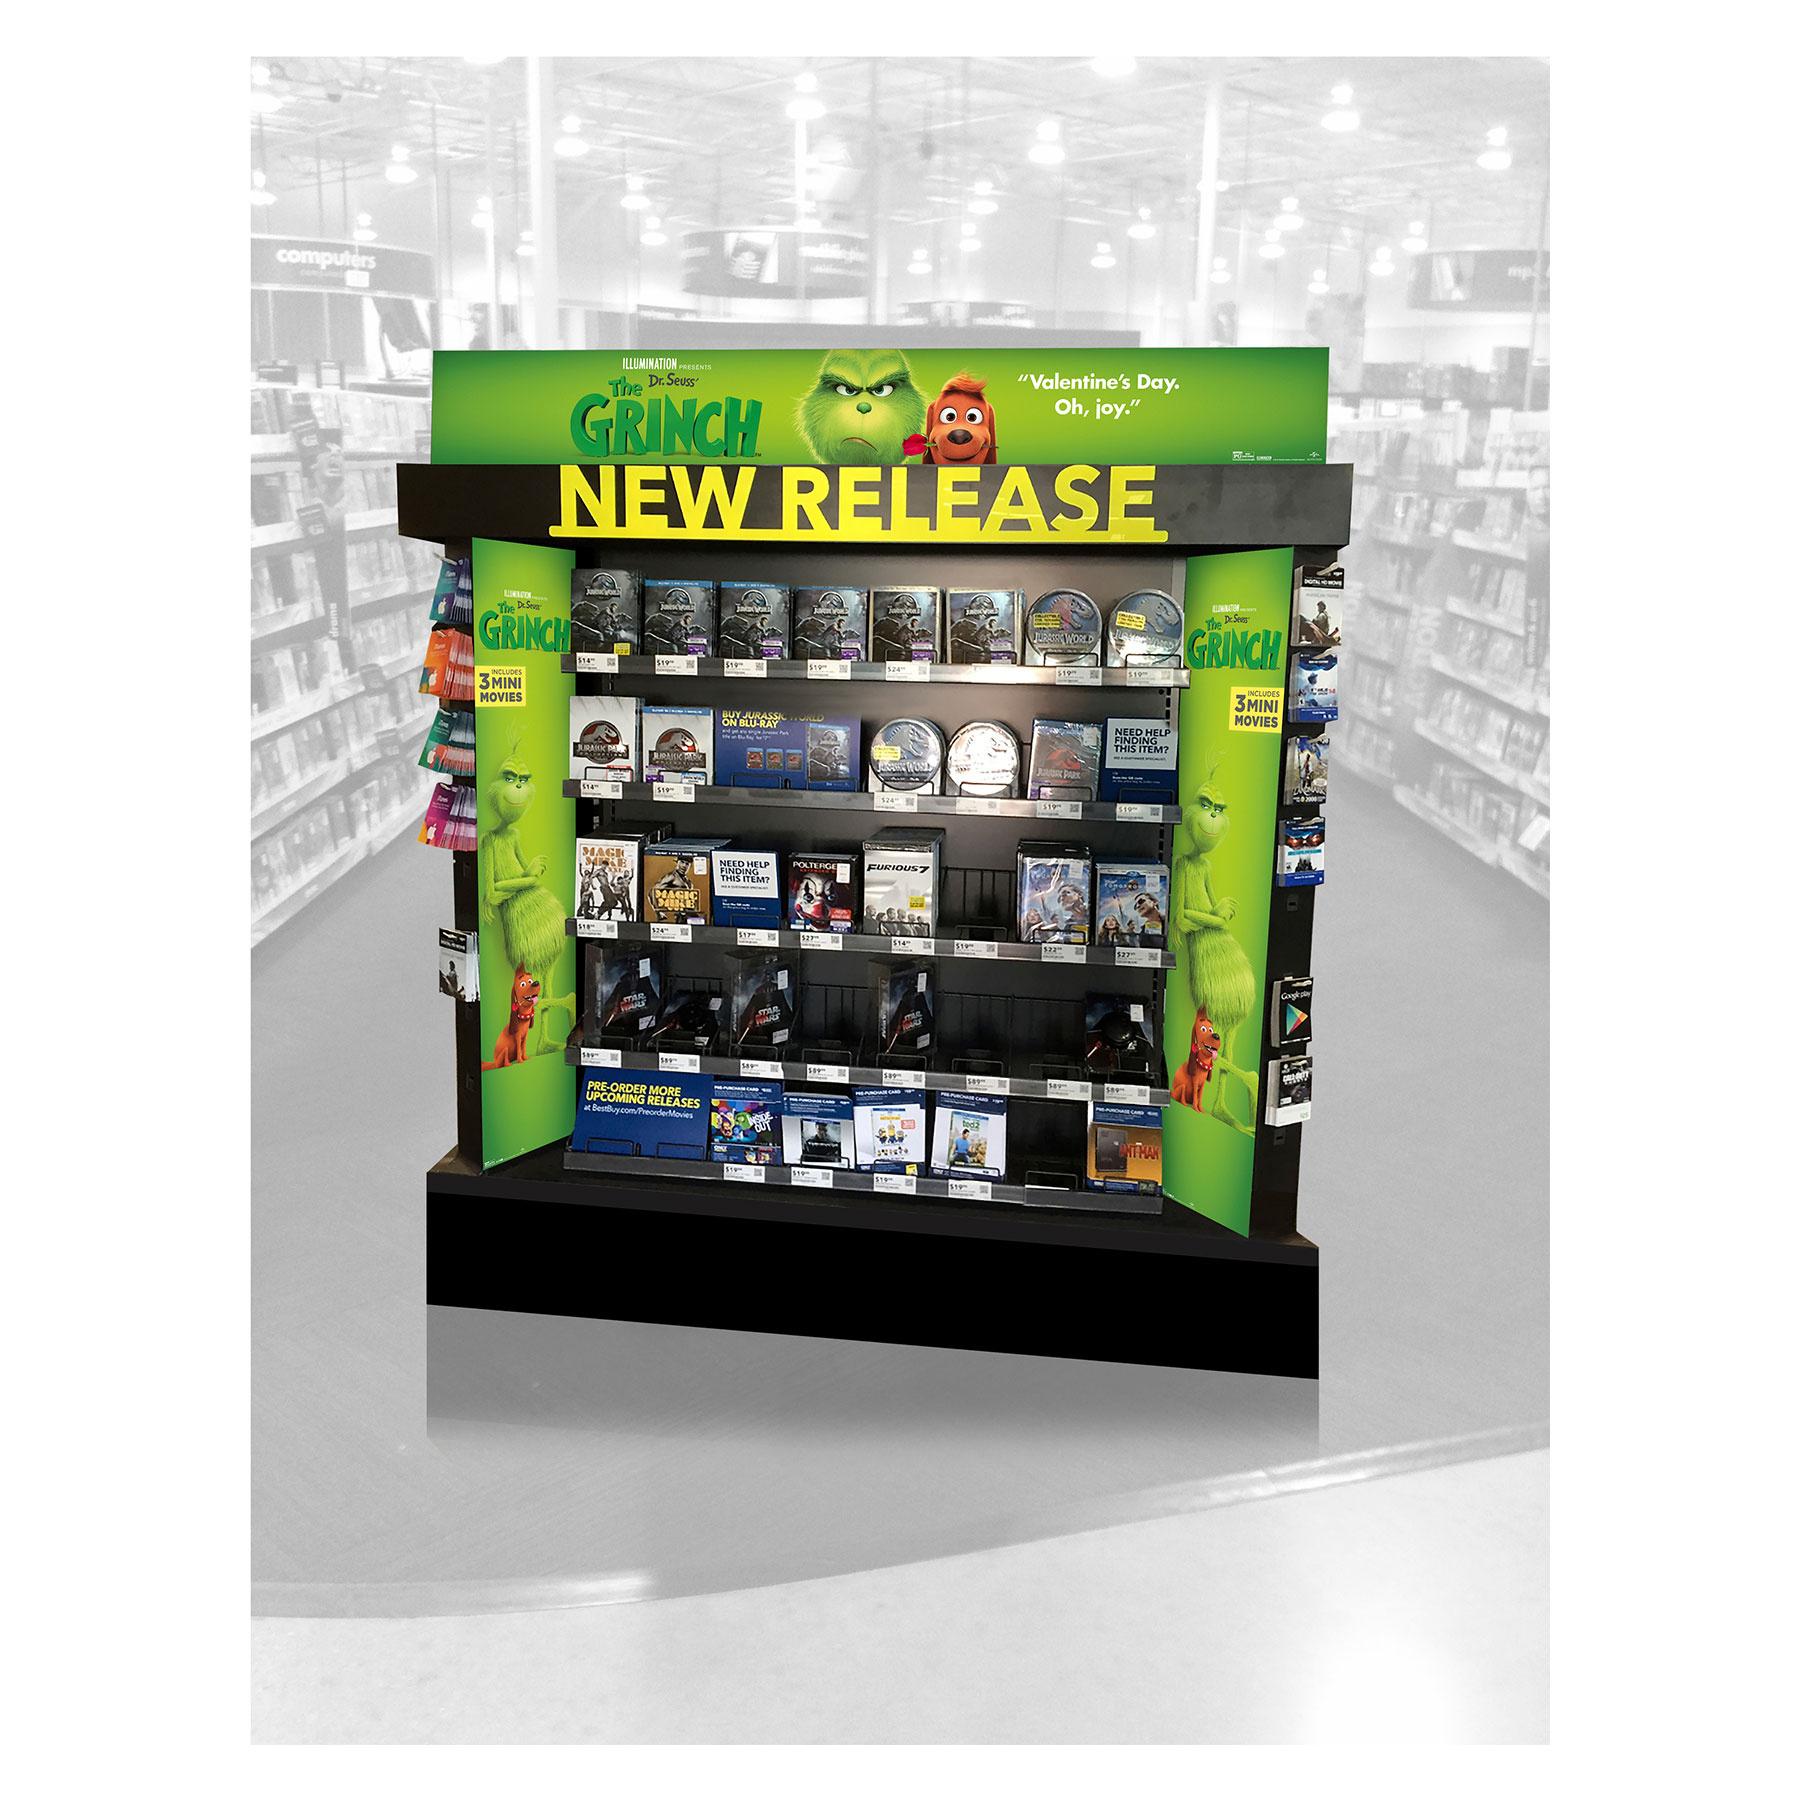 Grinch Best Buy New Release Display